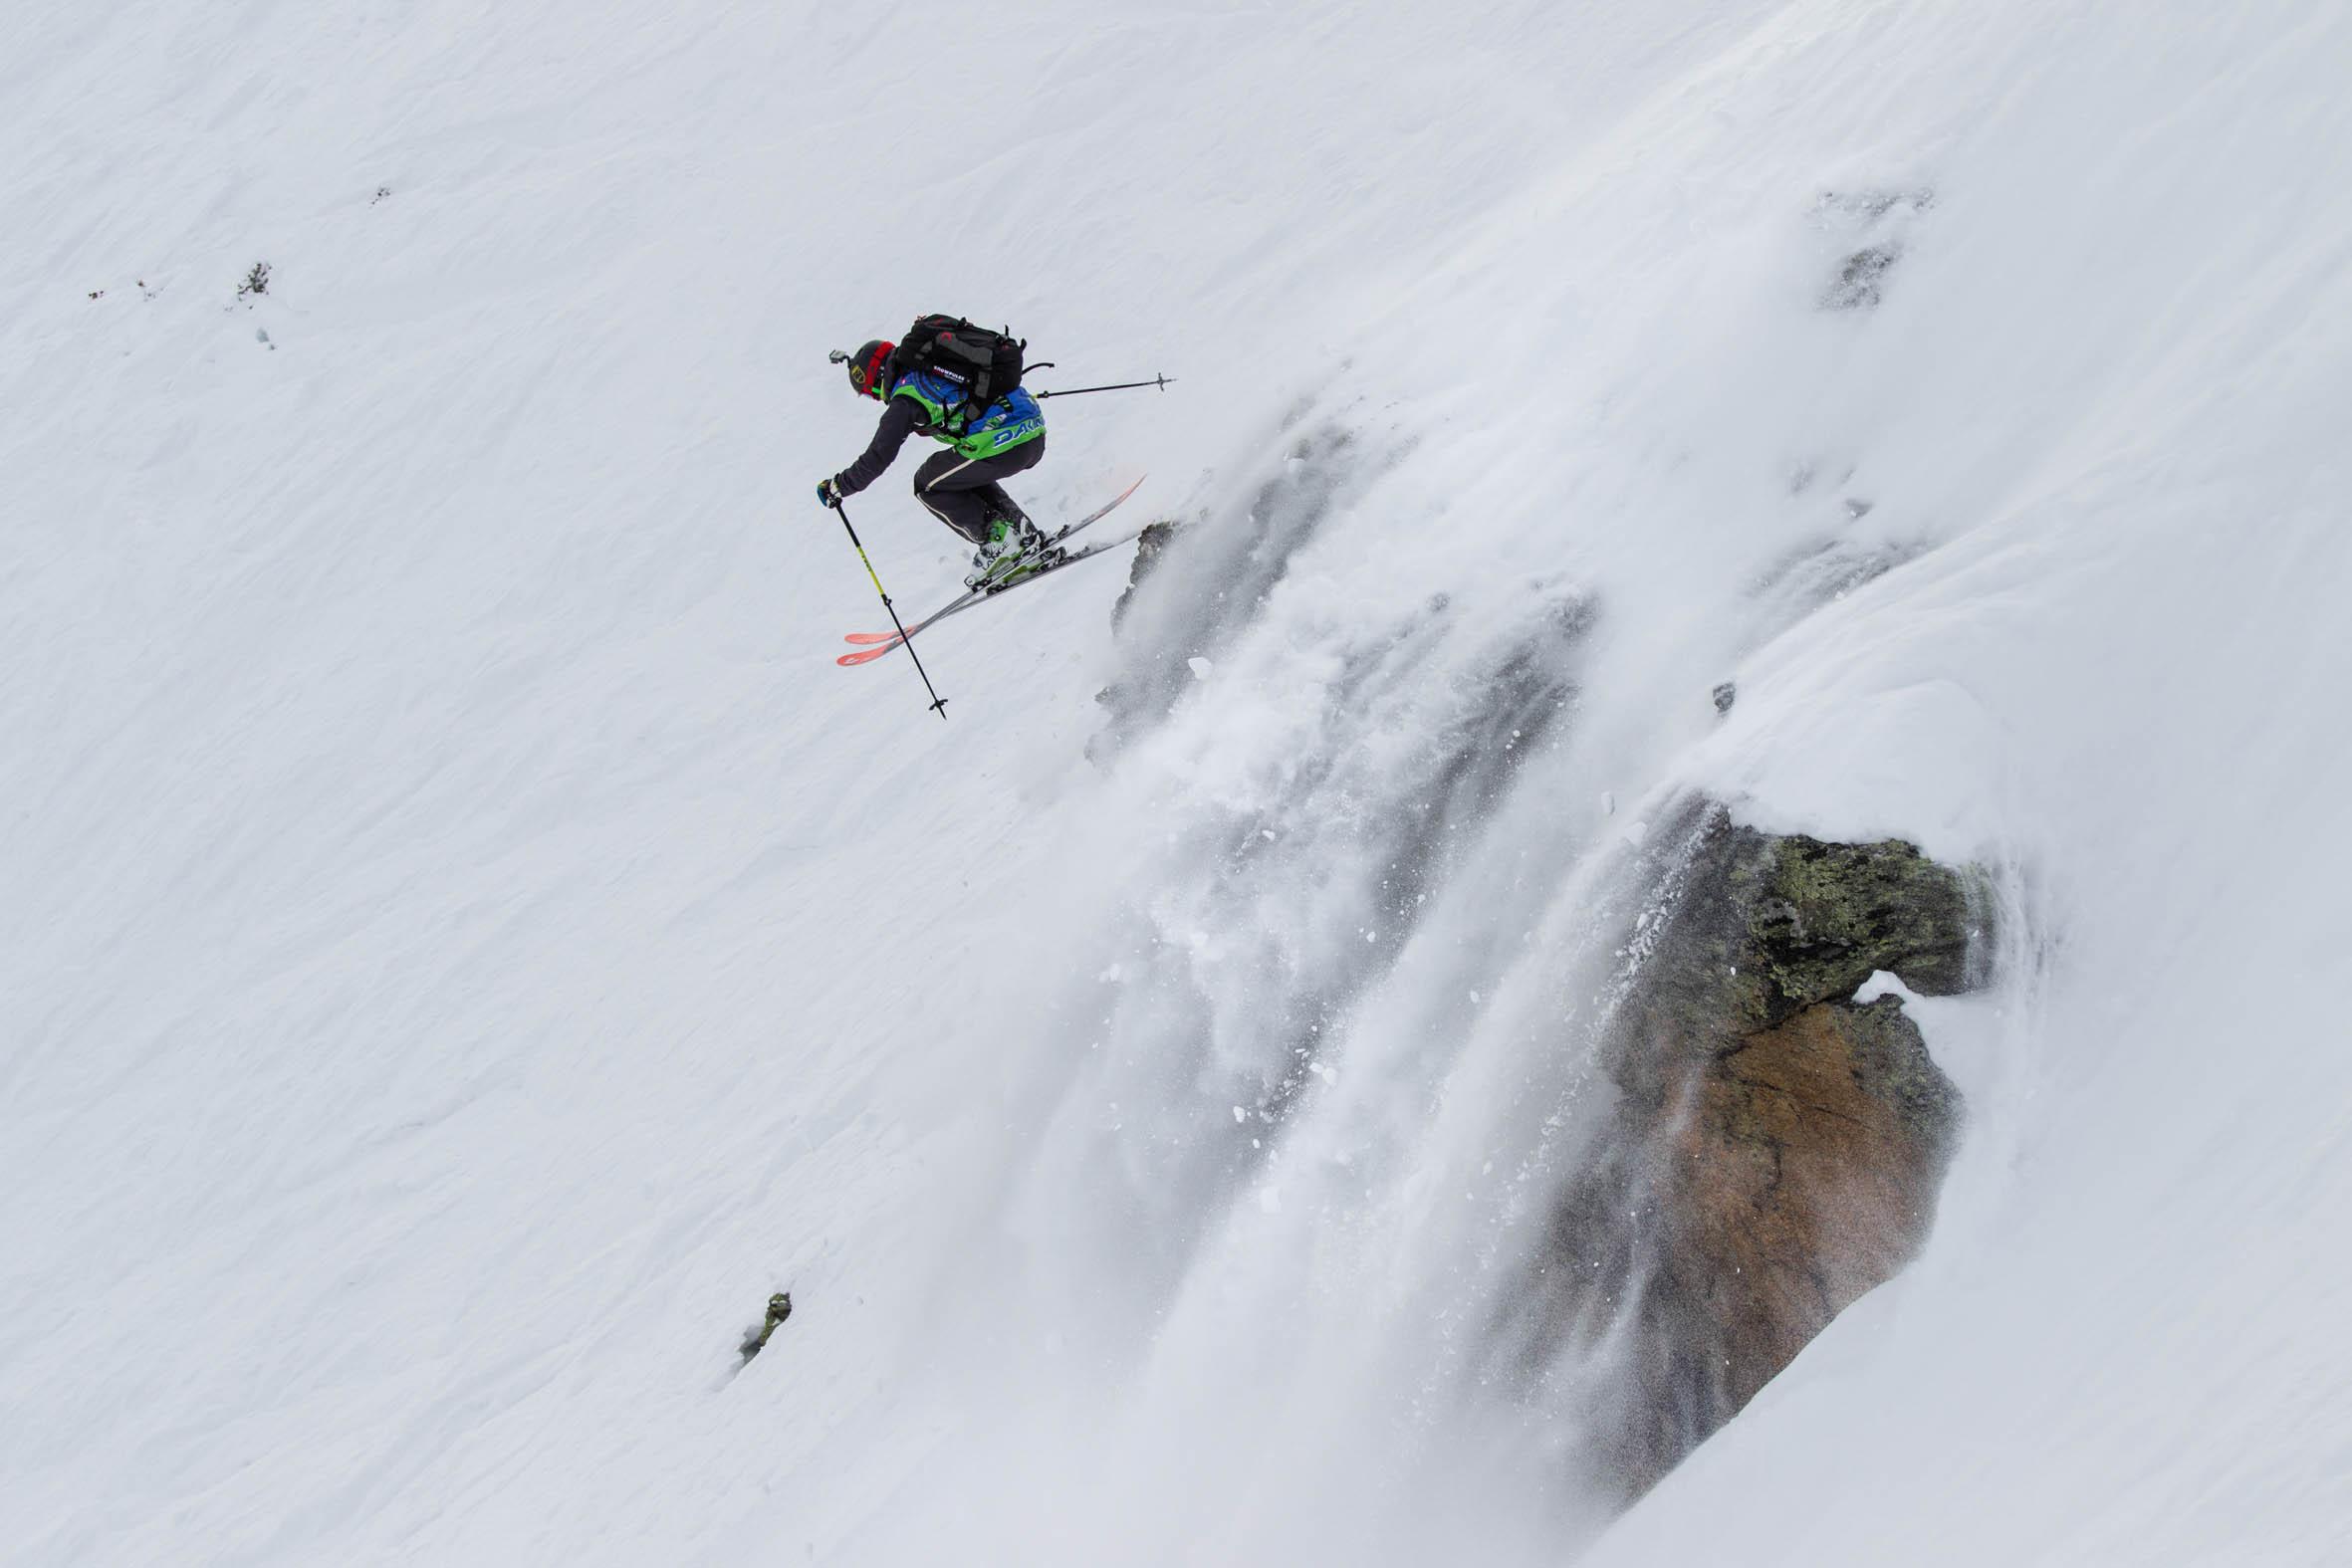 Freeride Junior Tour 2015 Chamonix-Mont-Blanc By Dakine - Photo : Tim Lloyd